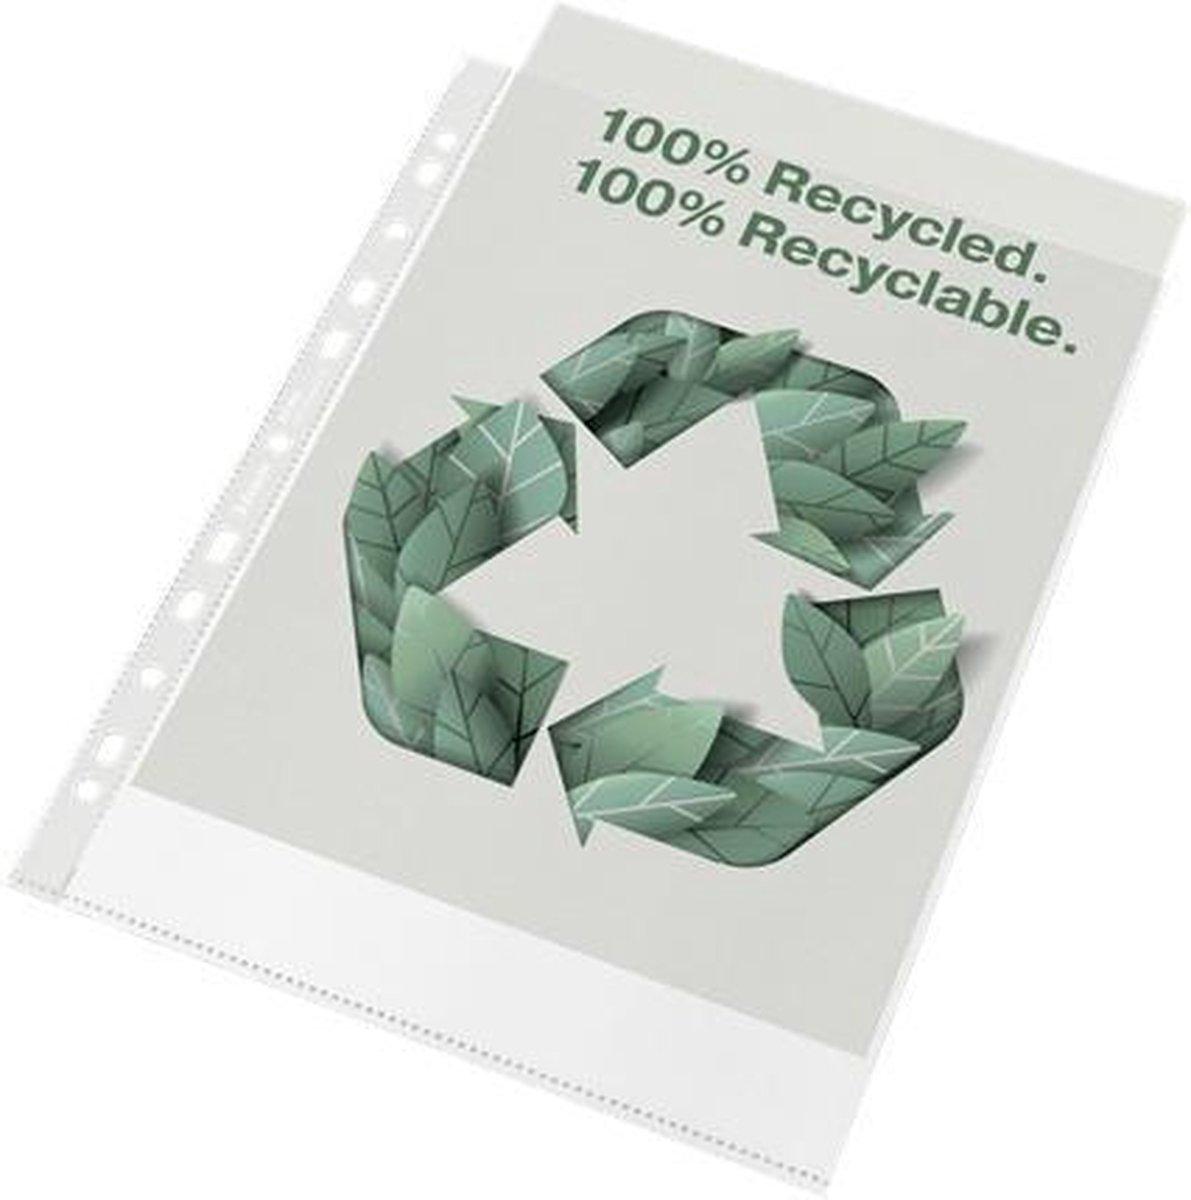 Esselte 100% Gerecyclede PP A4 Premium Showtas - 70 micron - 100x Transparante, Milieuvriendelijke Insteekhoezen - Duurzaamheid